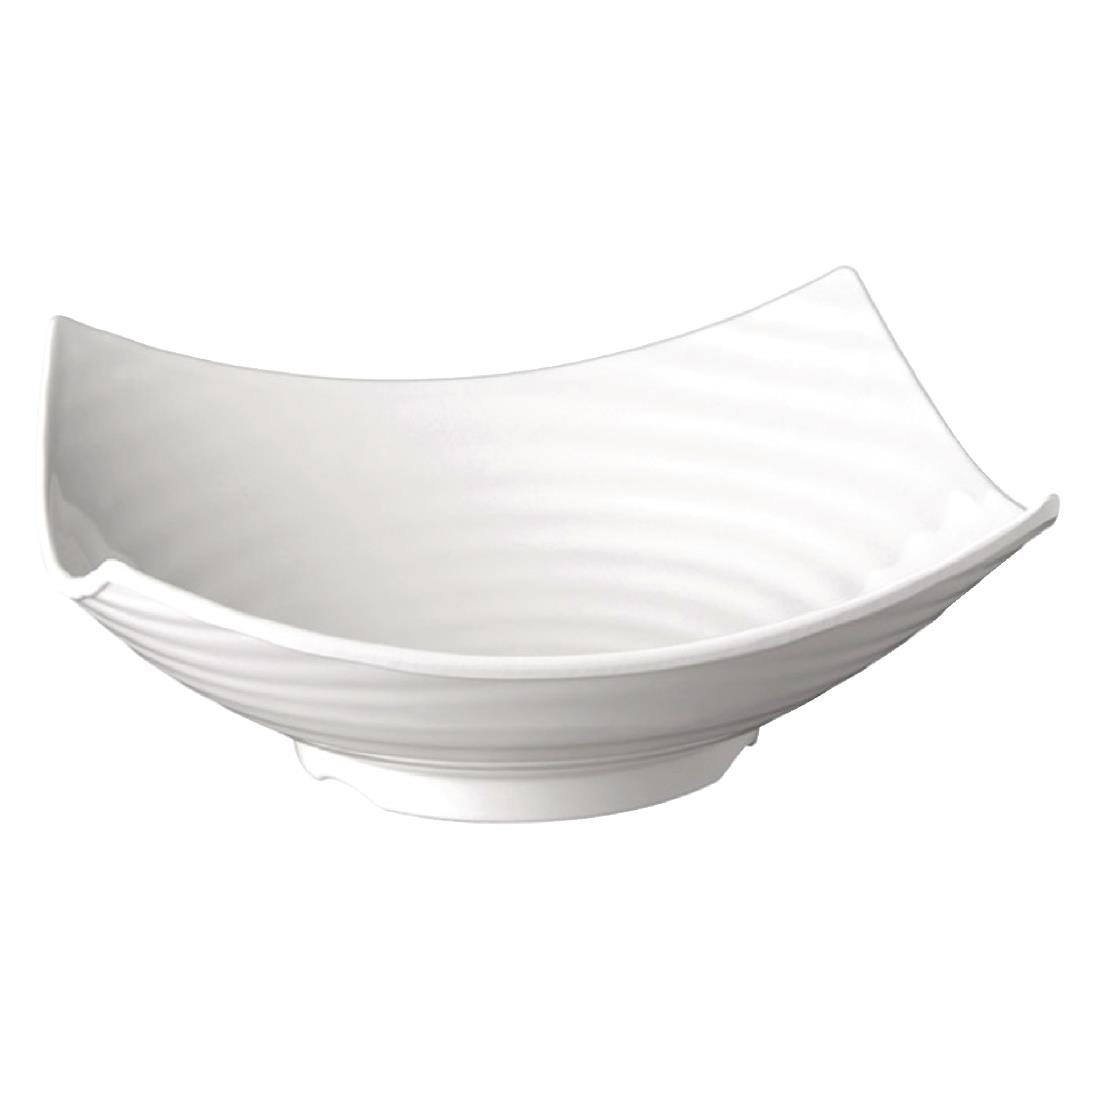 APS Global Melamine Dish 320mm (GF117)